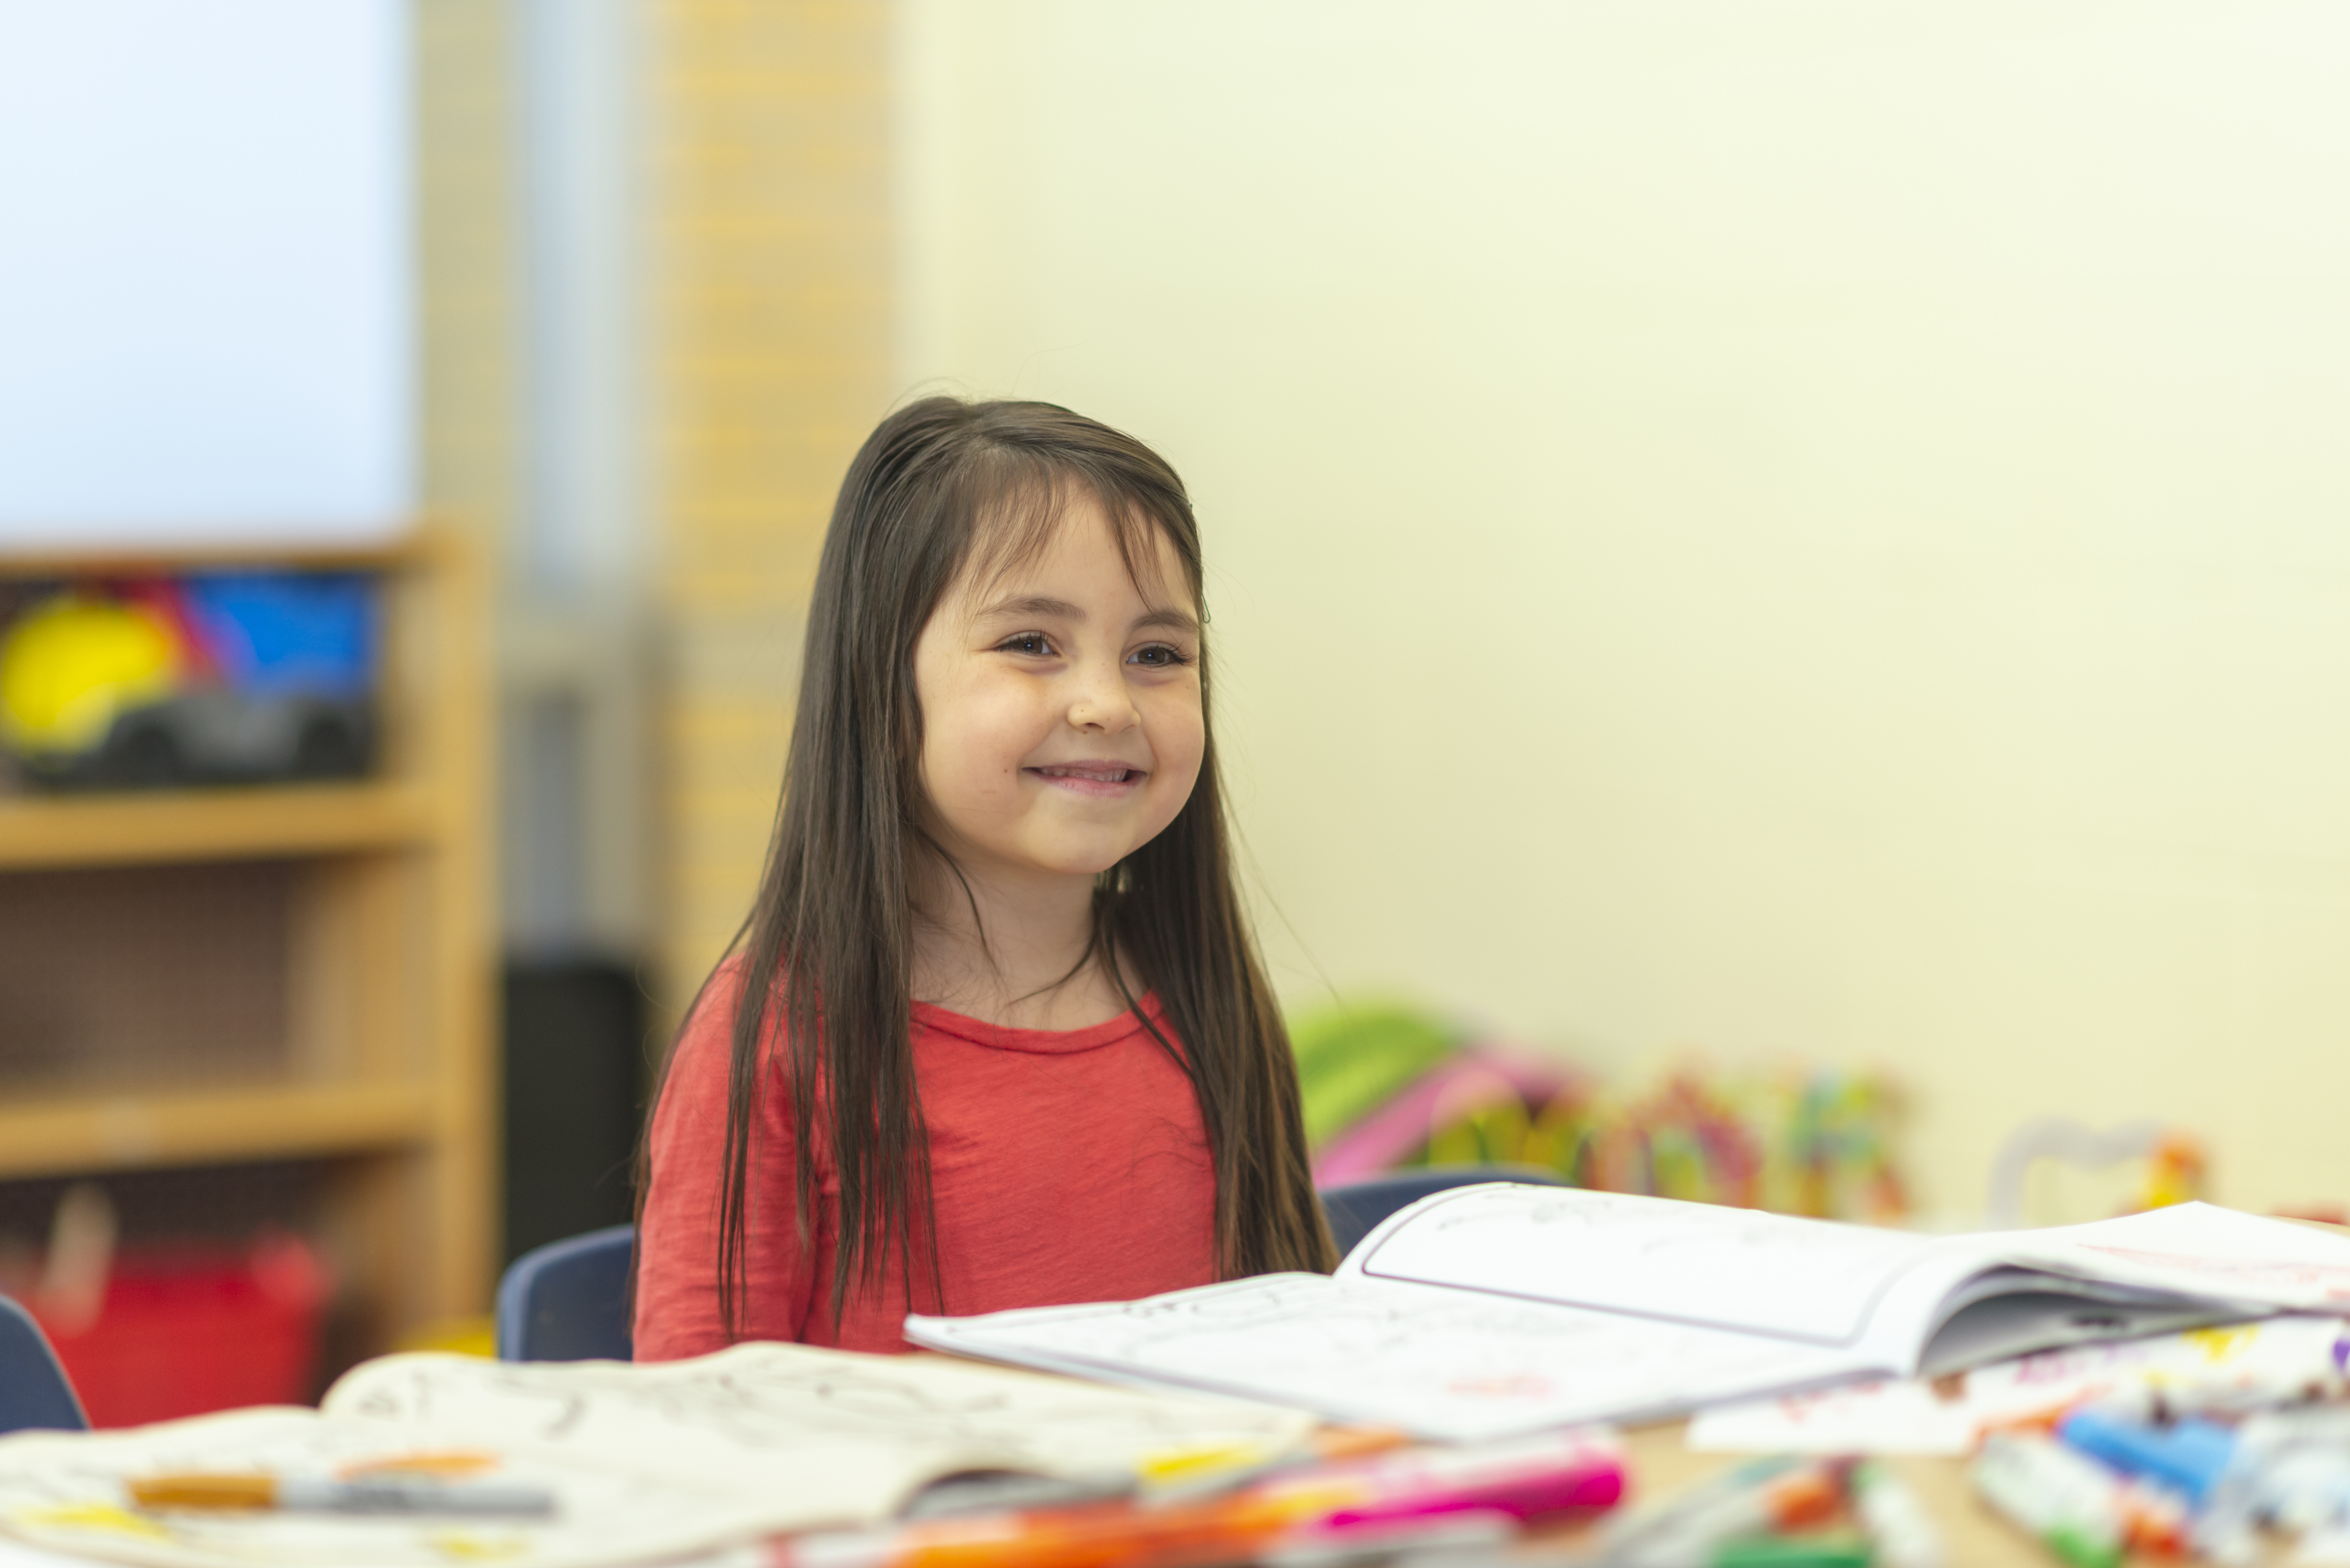 Happy child with books